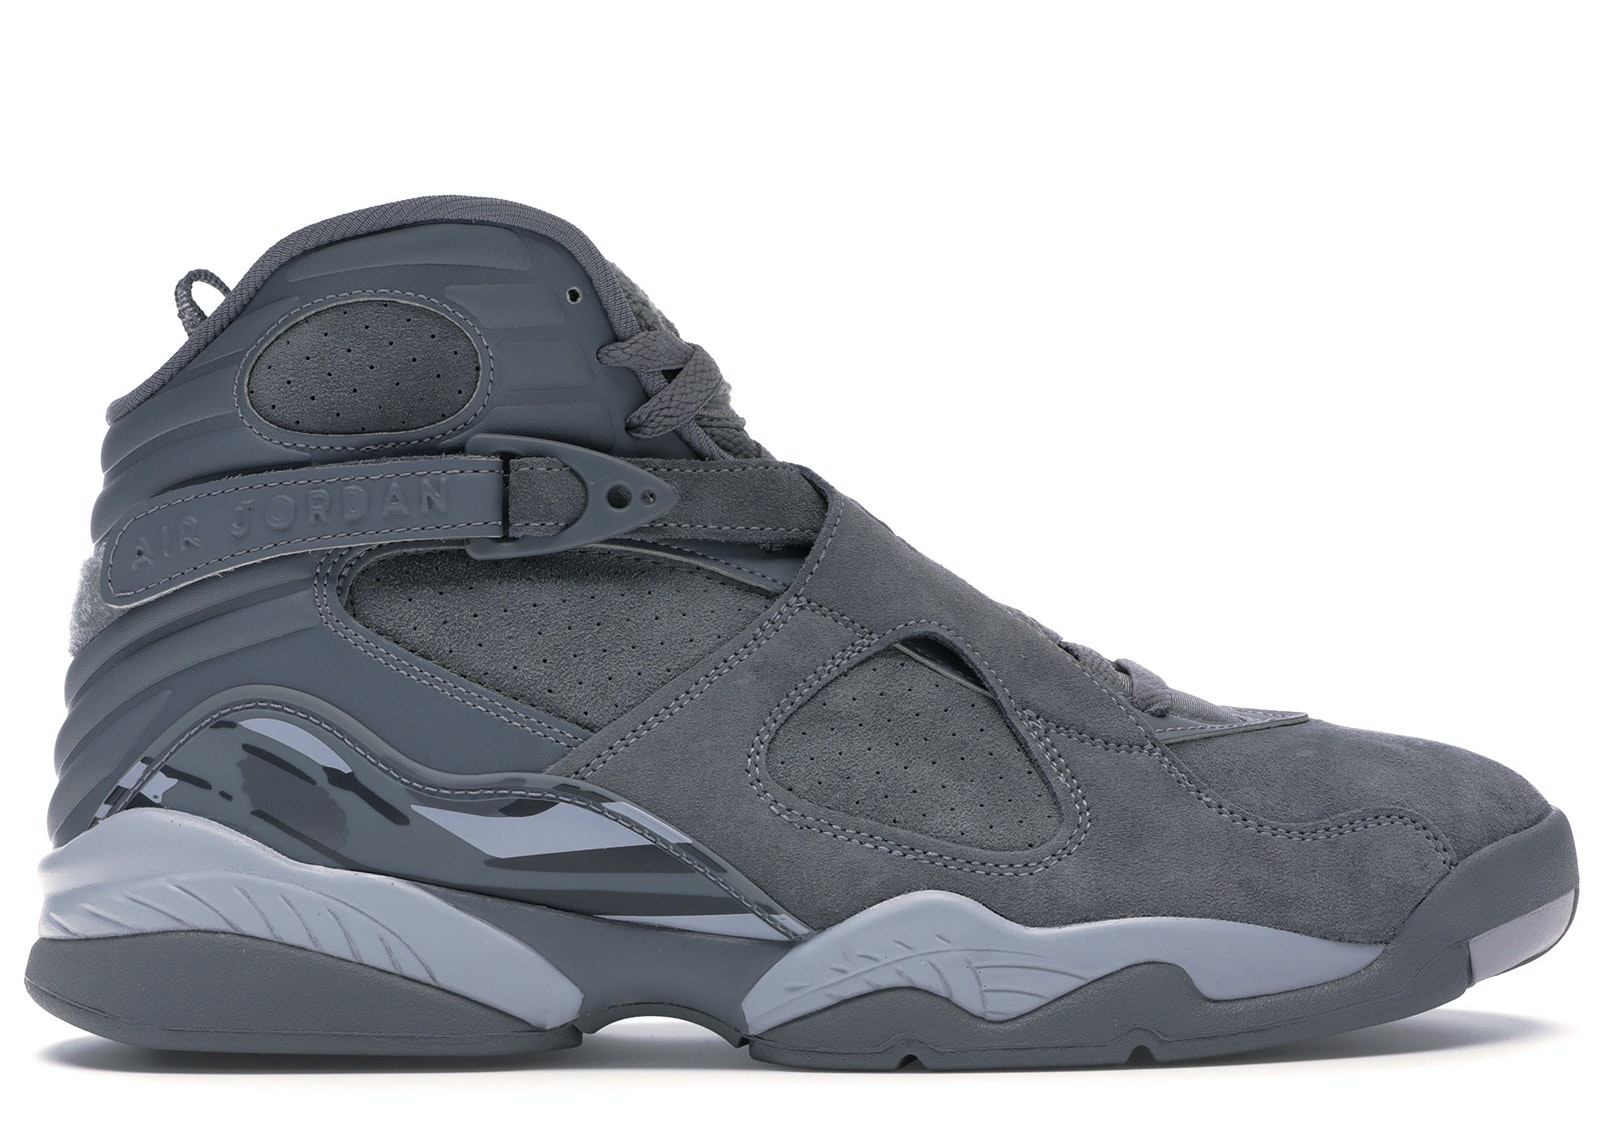 Jordan 8 Retro Cool Grey